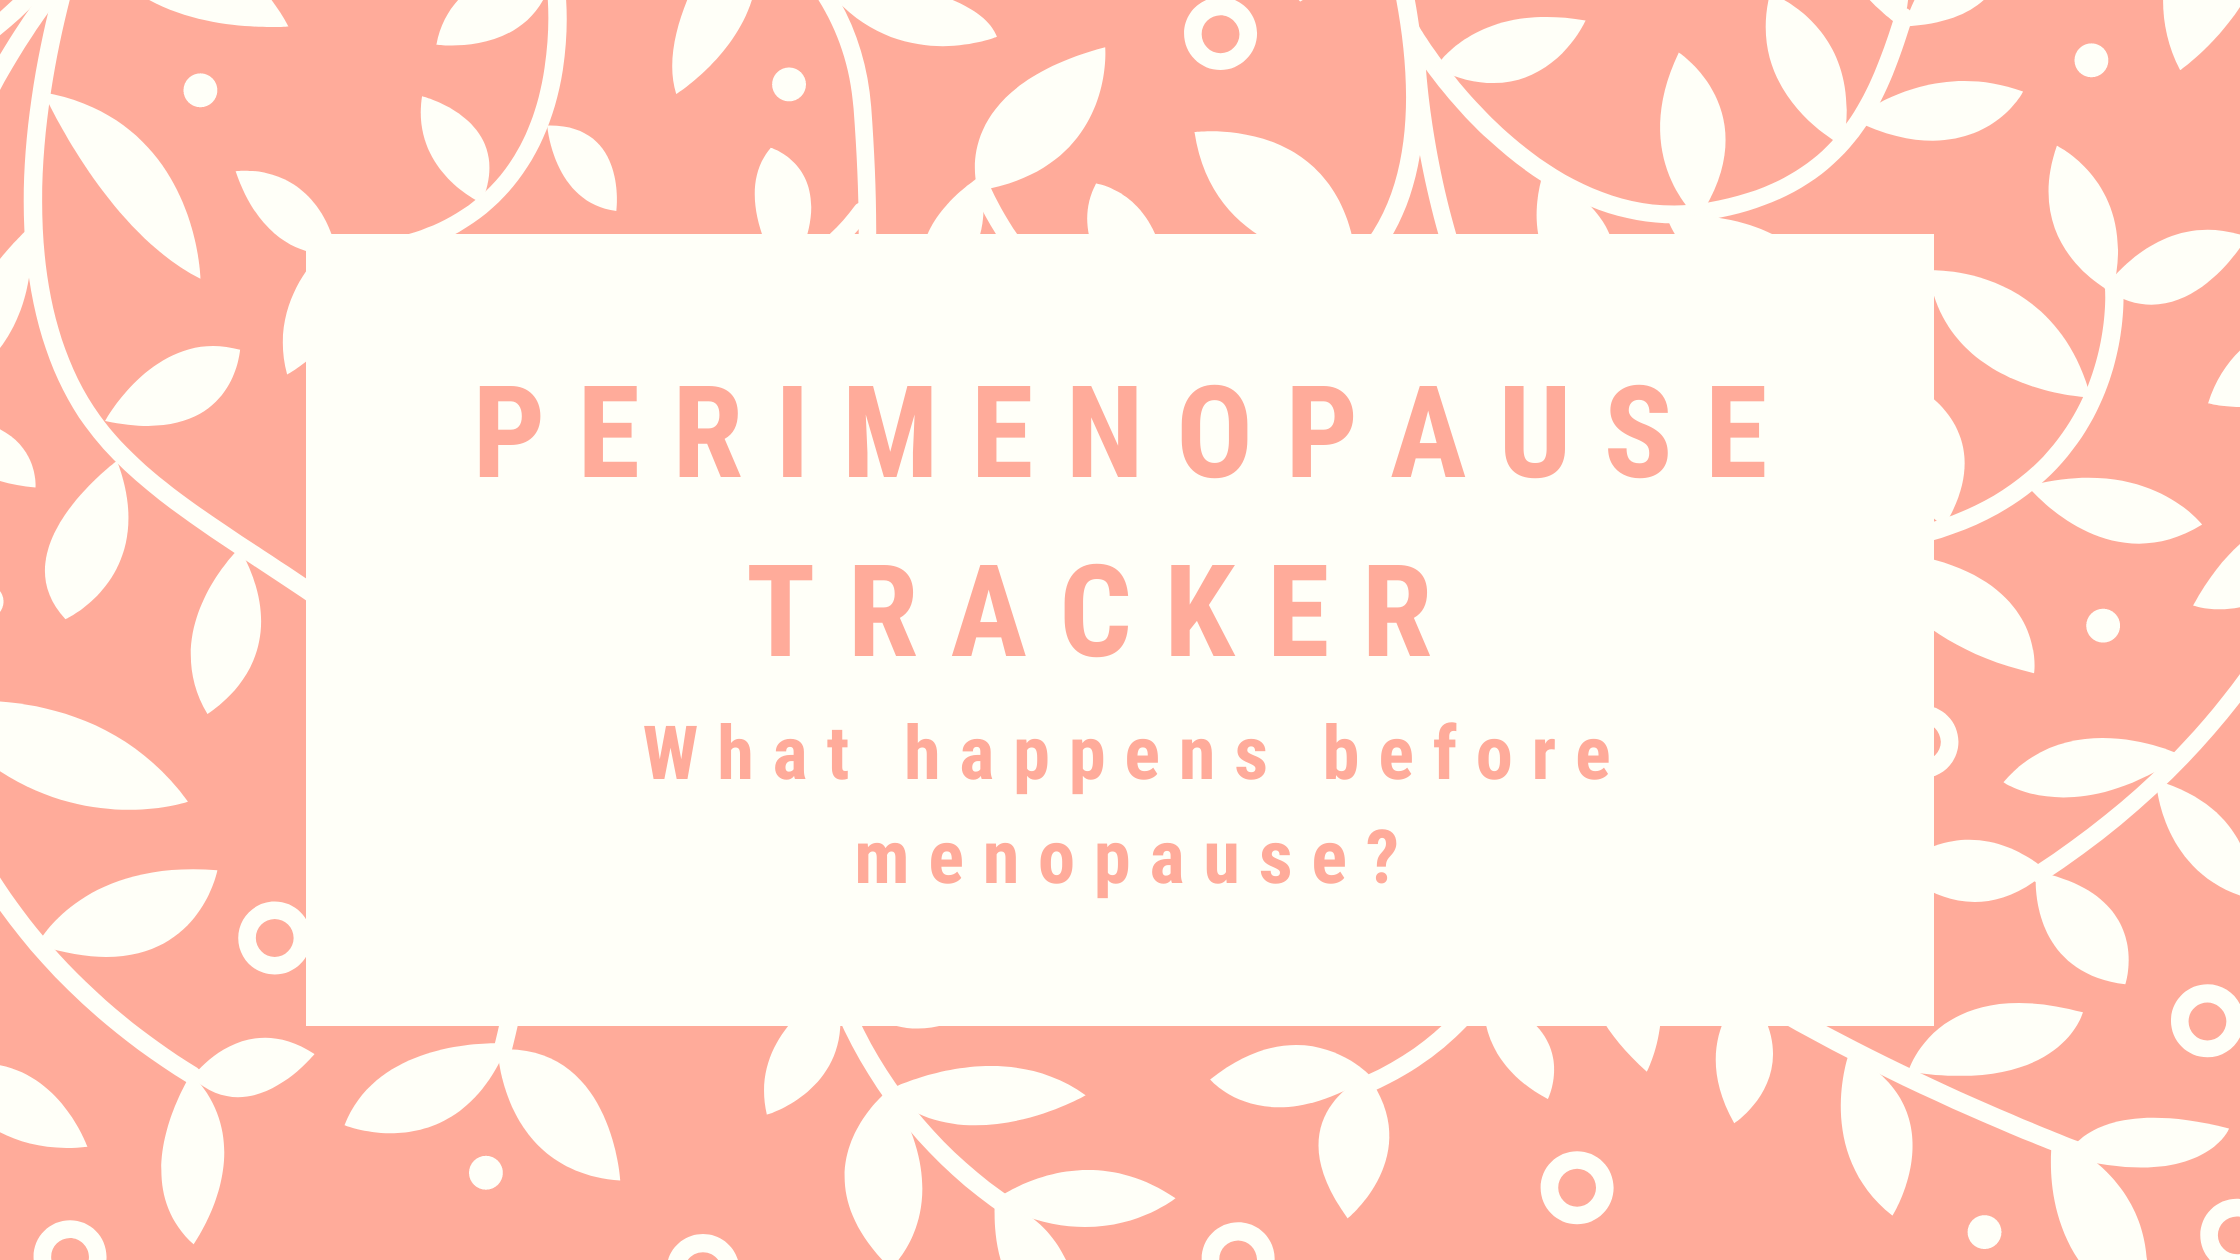 Perimenopause Tracker